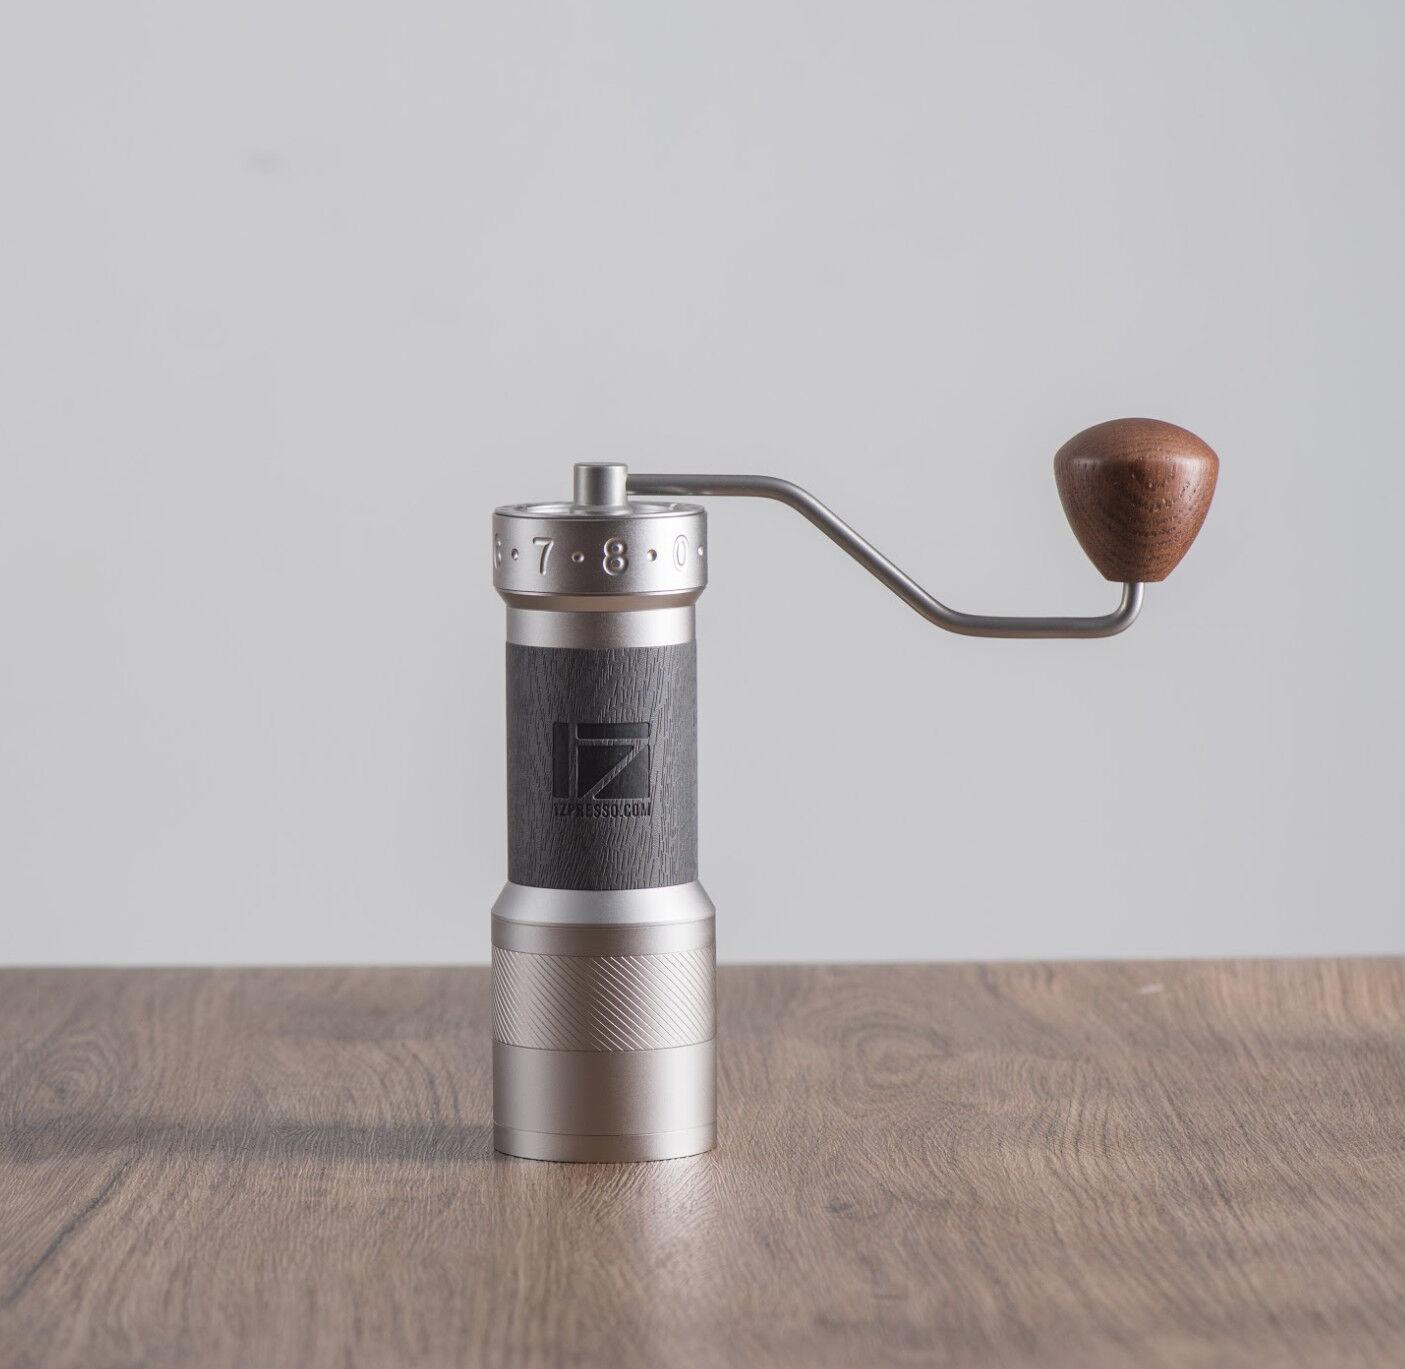 Kaffebox 1Zpresso K-PLUS Manual Coffee Grinder - Grey